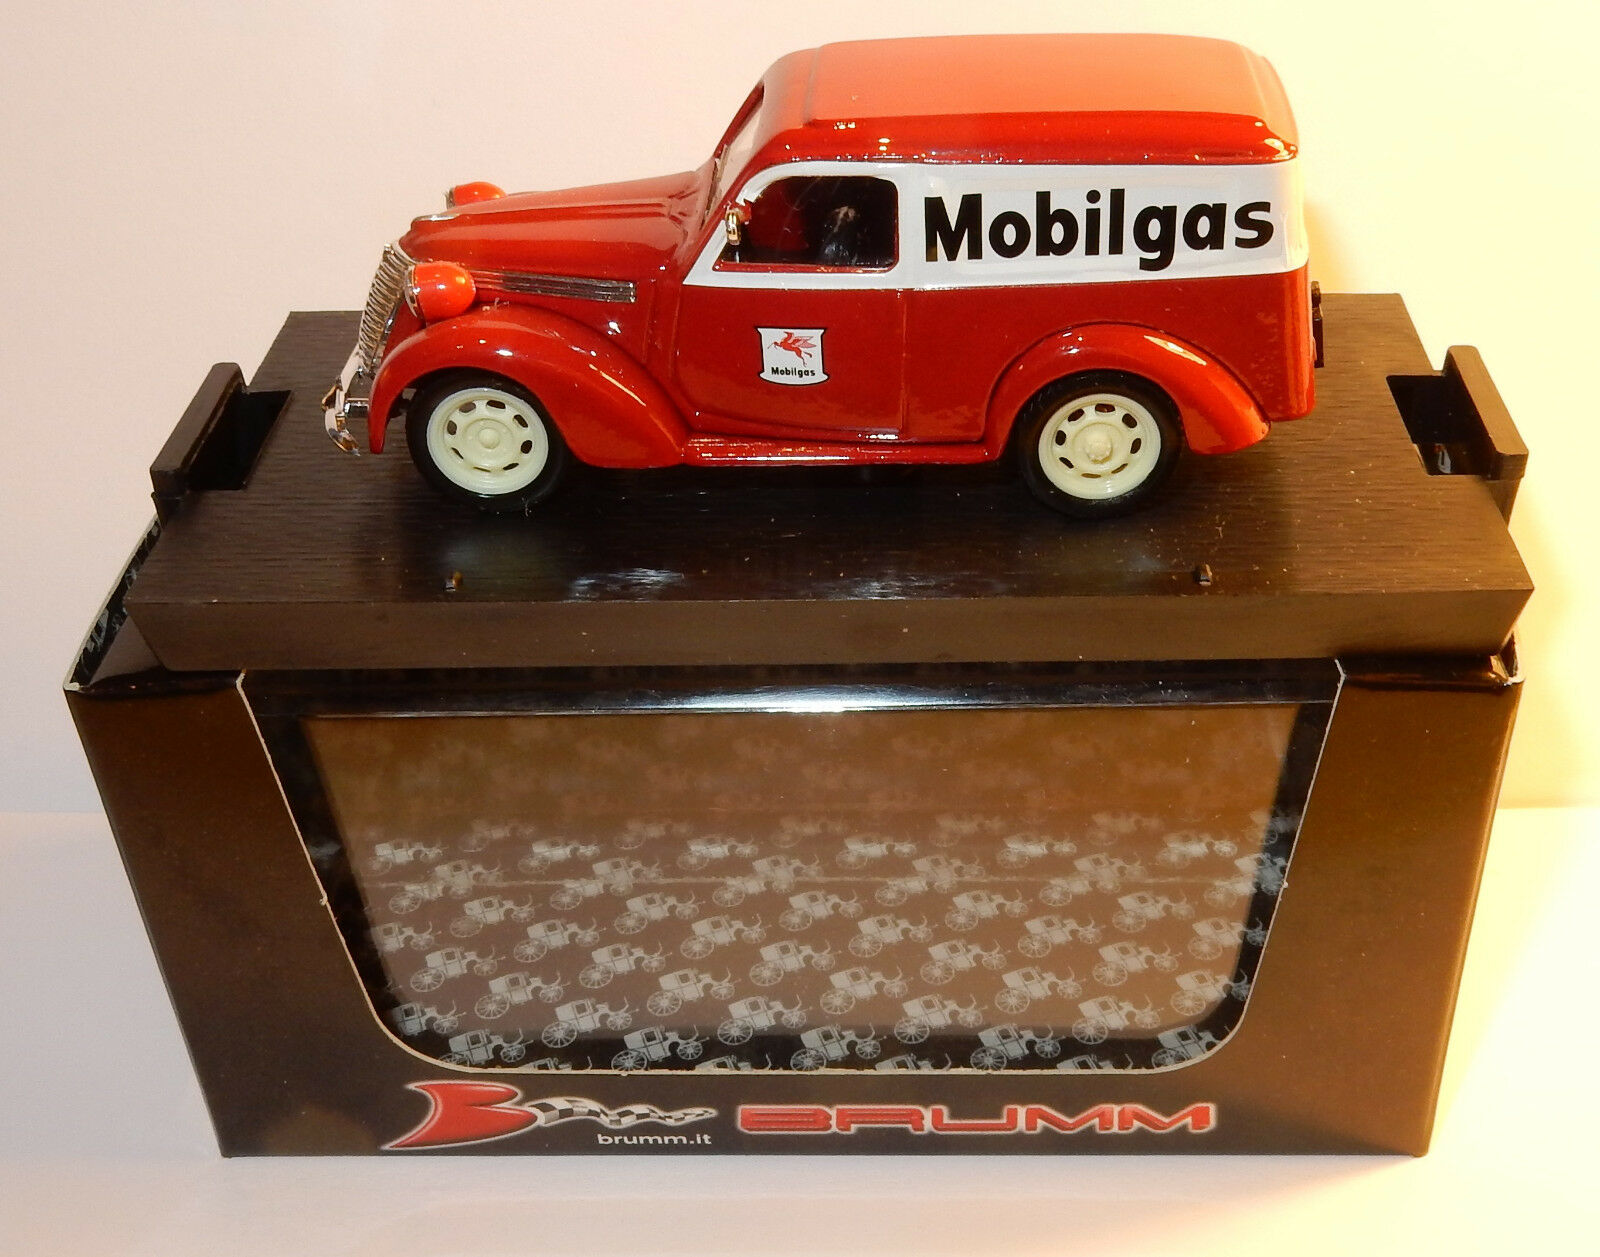 BRUMM FIAT 1100E FURGONE 1956 COMMERCIAL MOBILGAS 1 43 R344 IN BOX